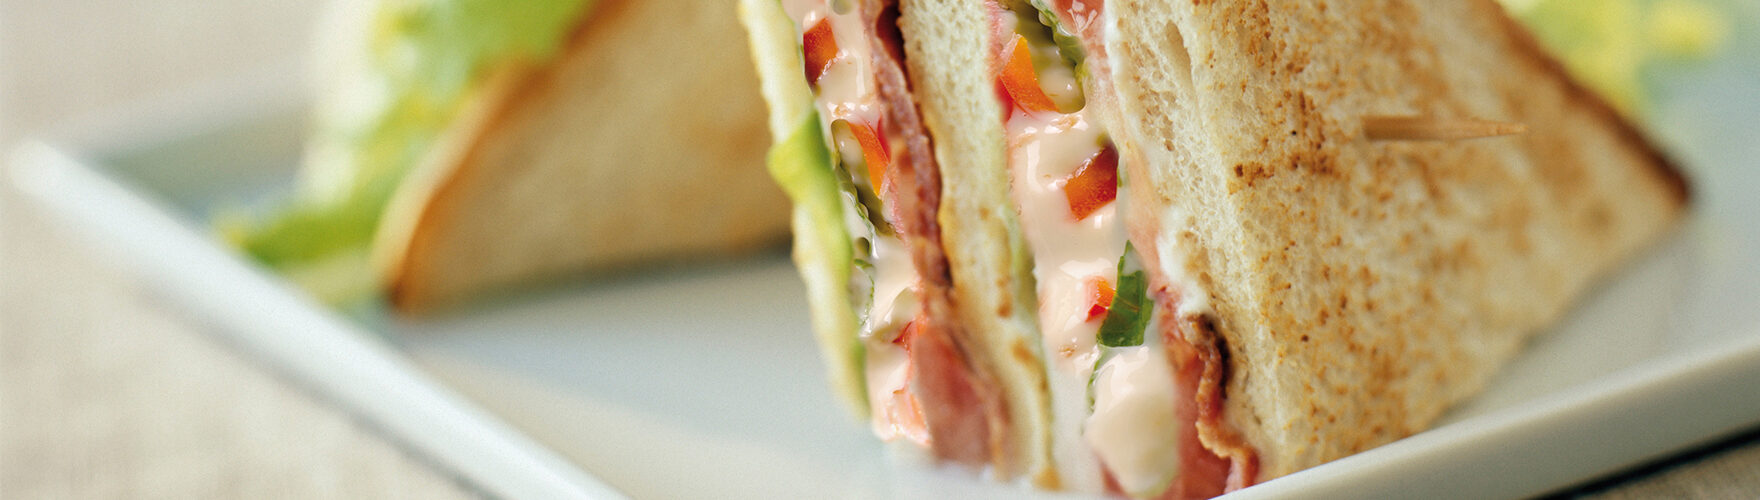 Klassieke club sandwich